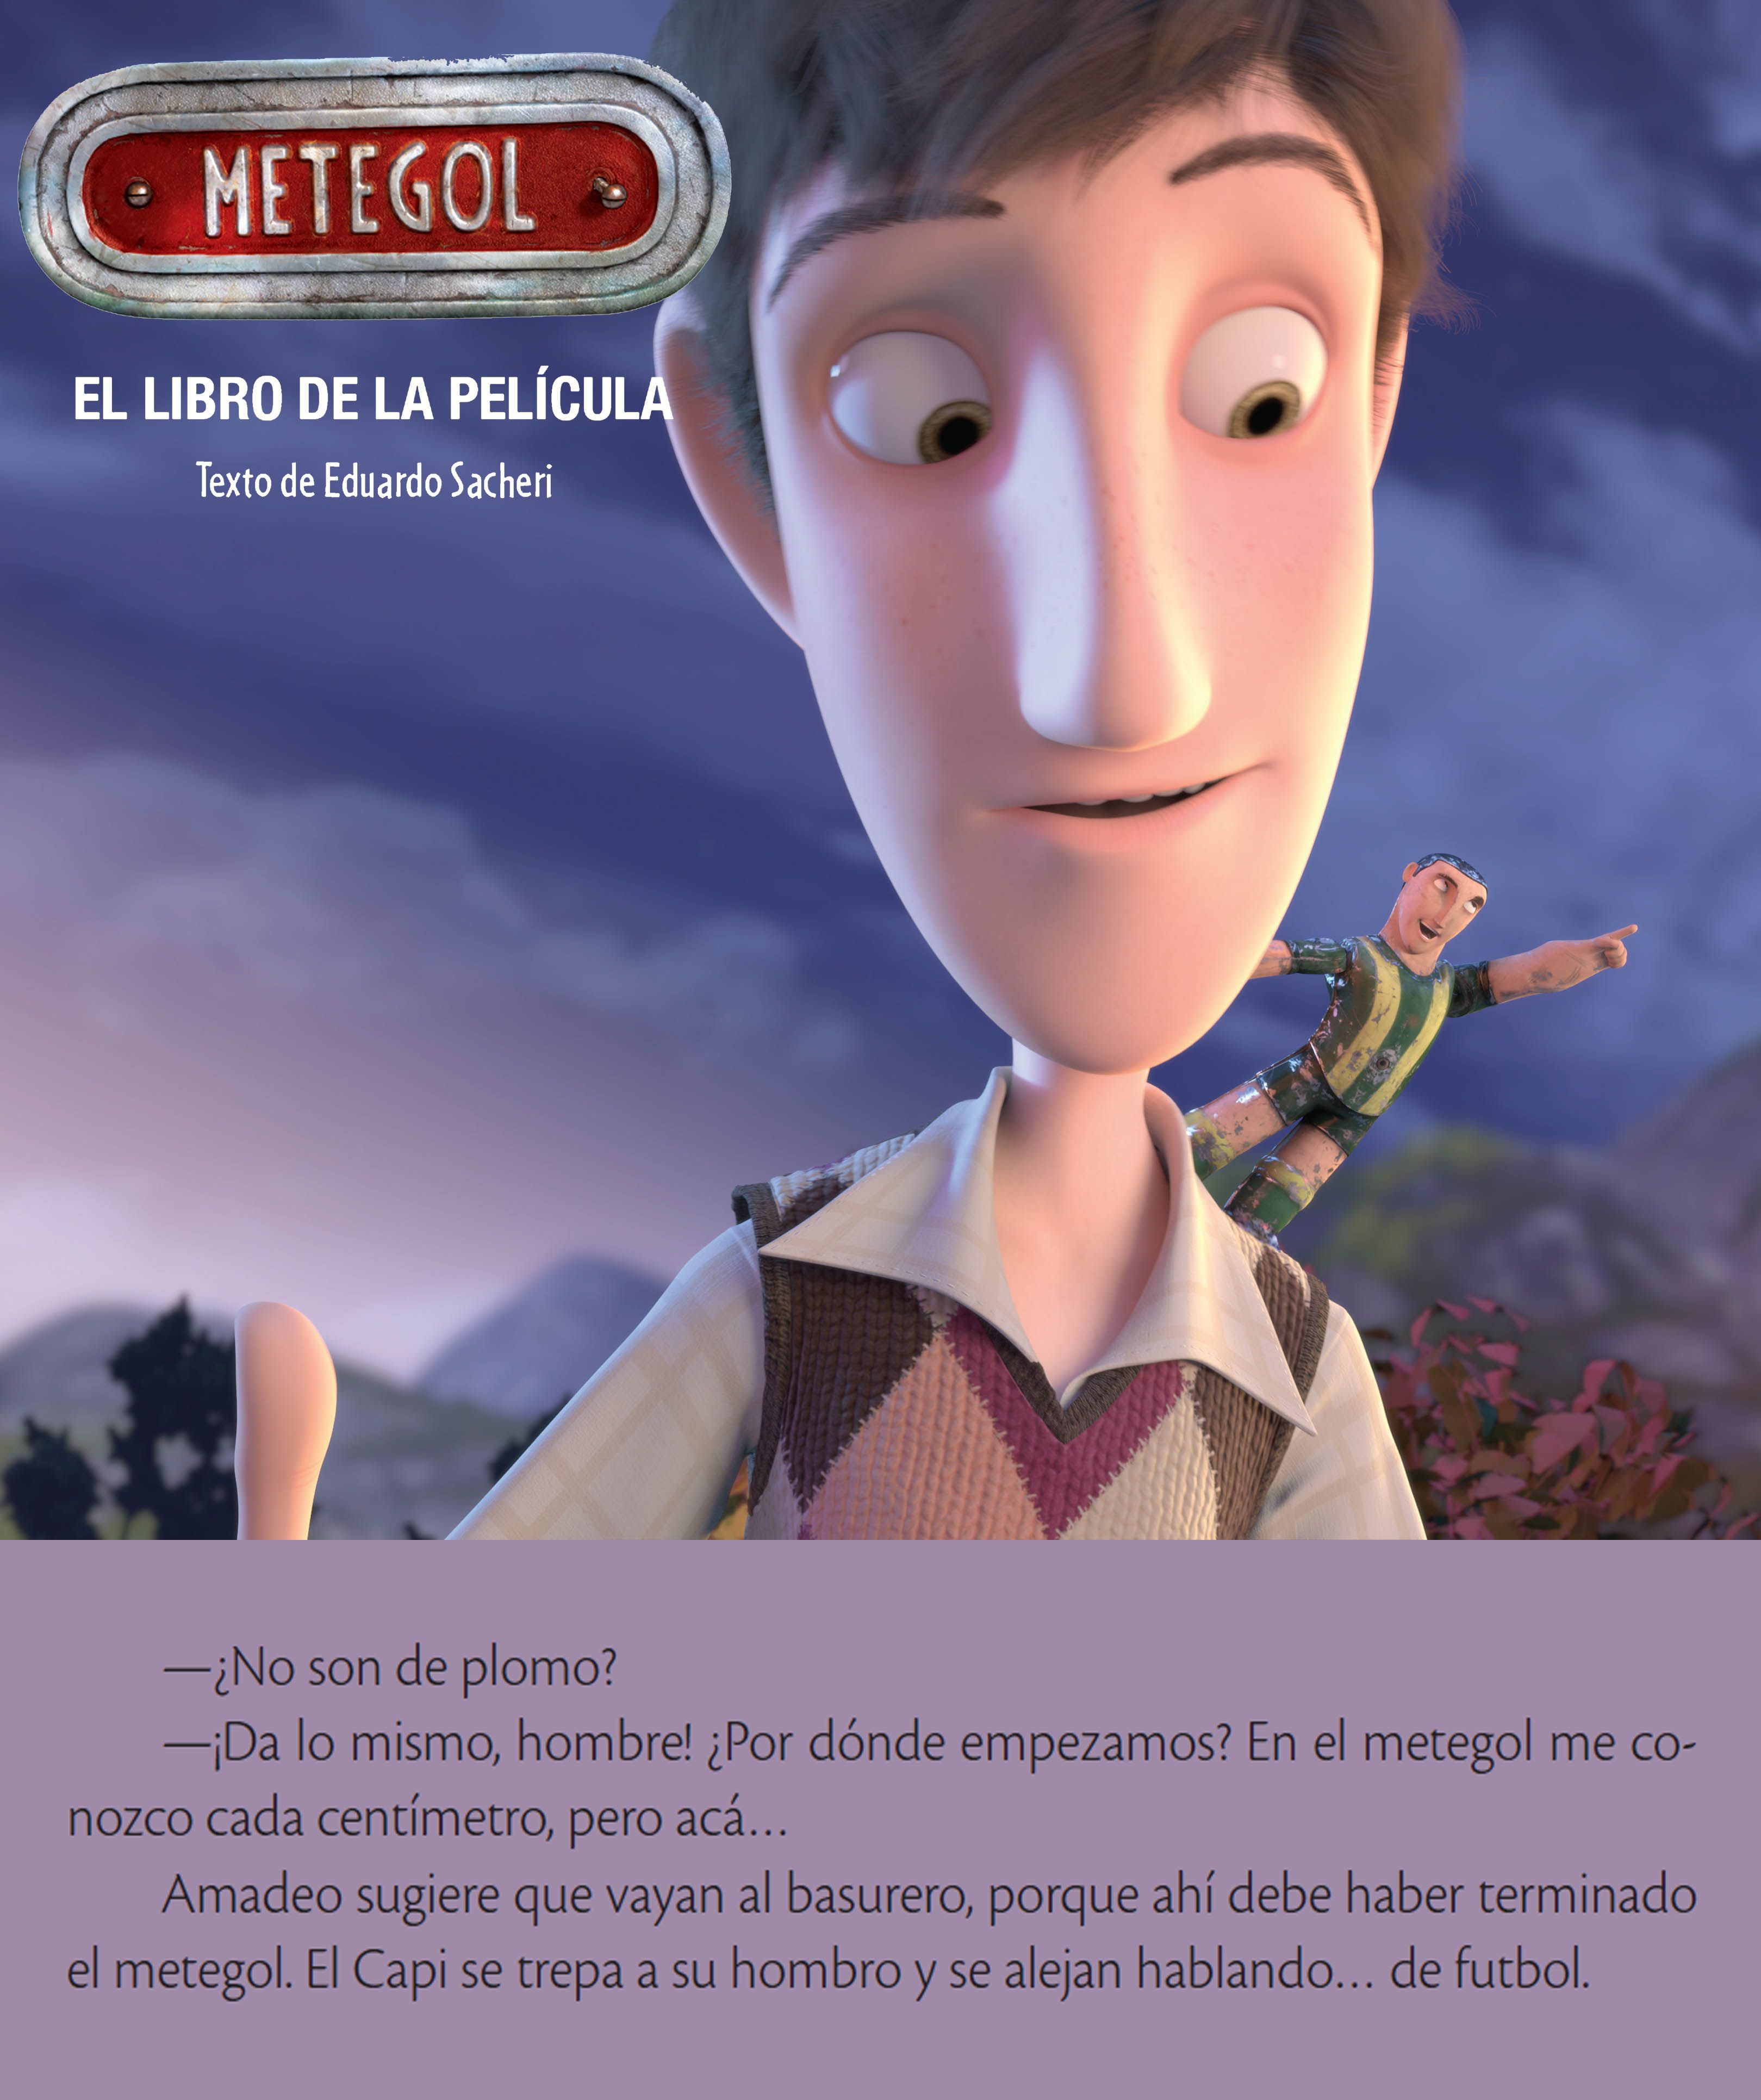 Metegol Animation 3d Animation Film